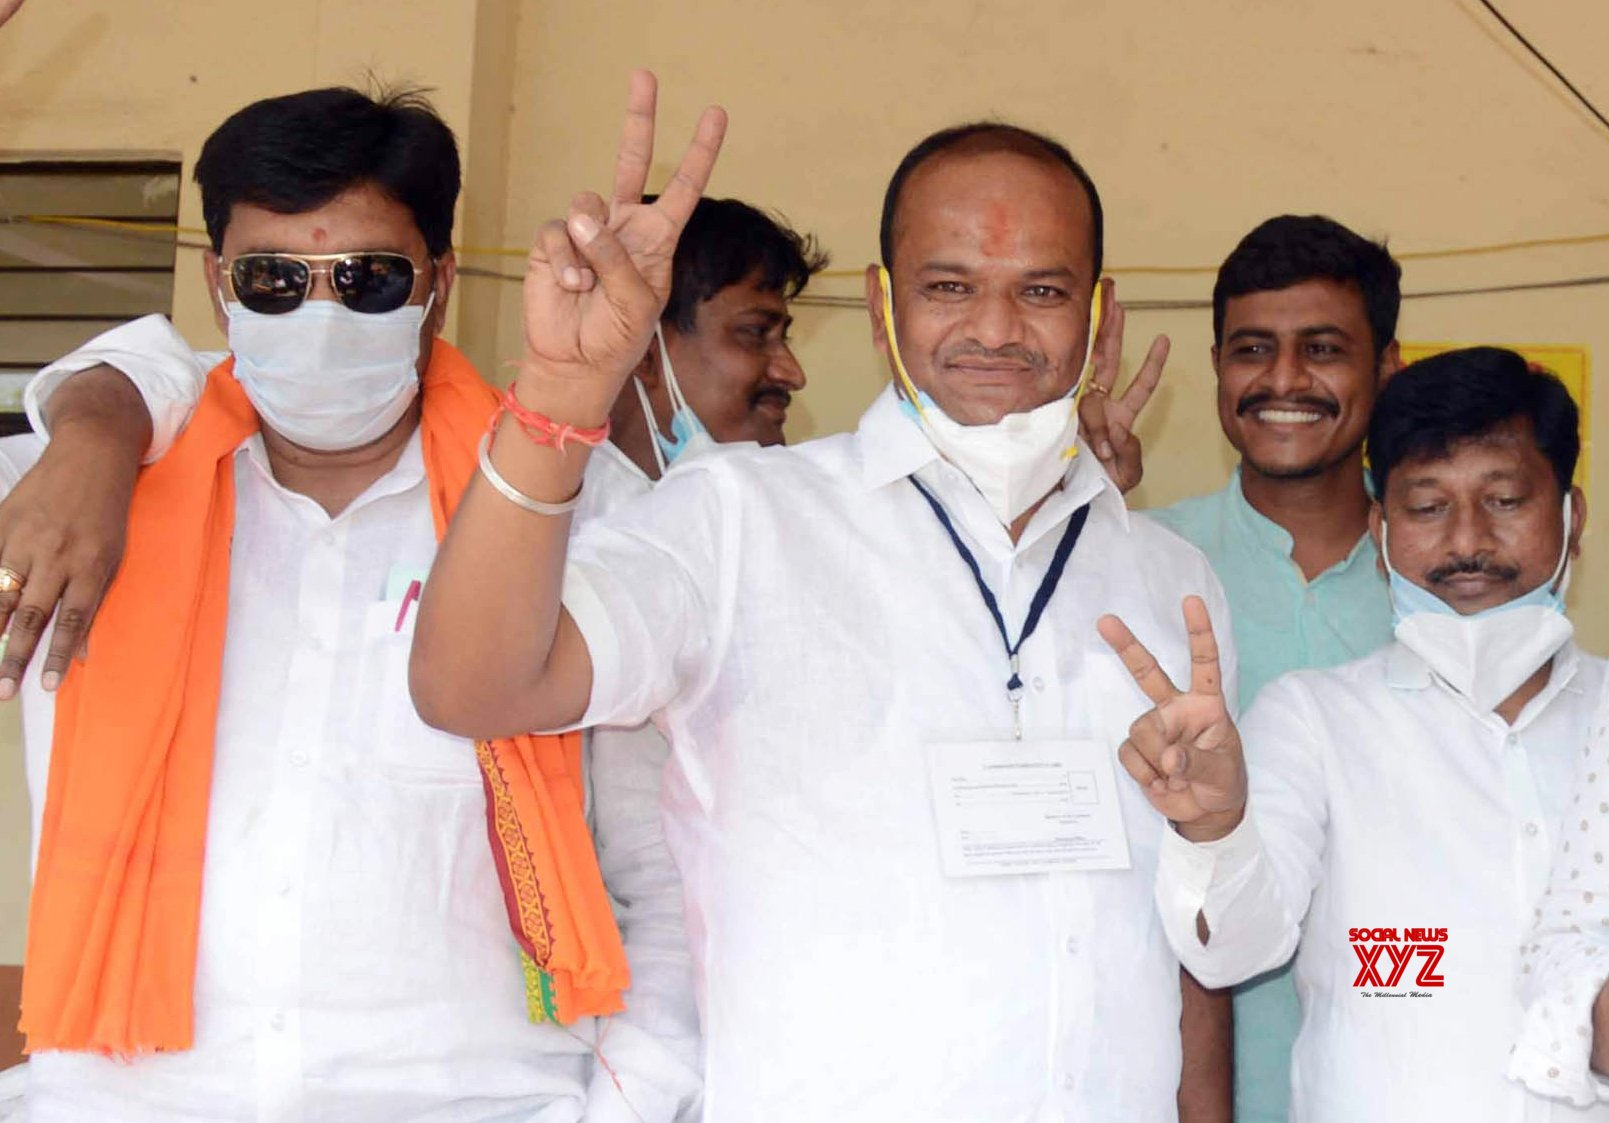 Bengaluru: BJP candidate Sharanu Salagar won the Basavakalyan assembly seat by a 20,904 vote margin against Congress candidate Mala B Narayan Rao, in Basavakalyan on Sunday 2nd May 2021 #Gallery